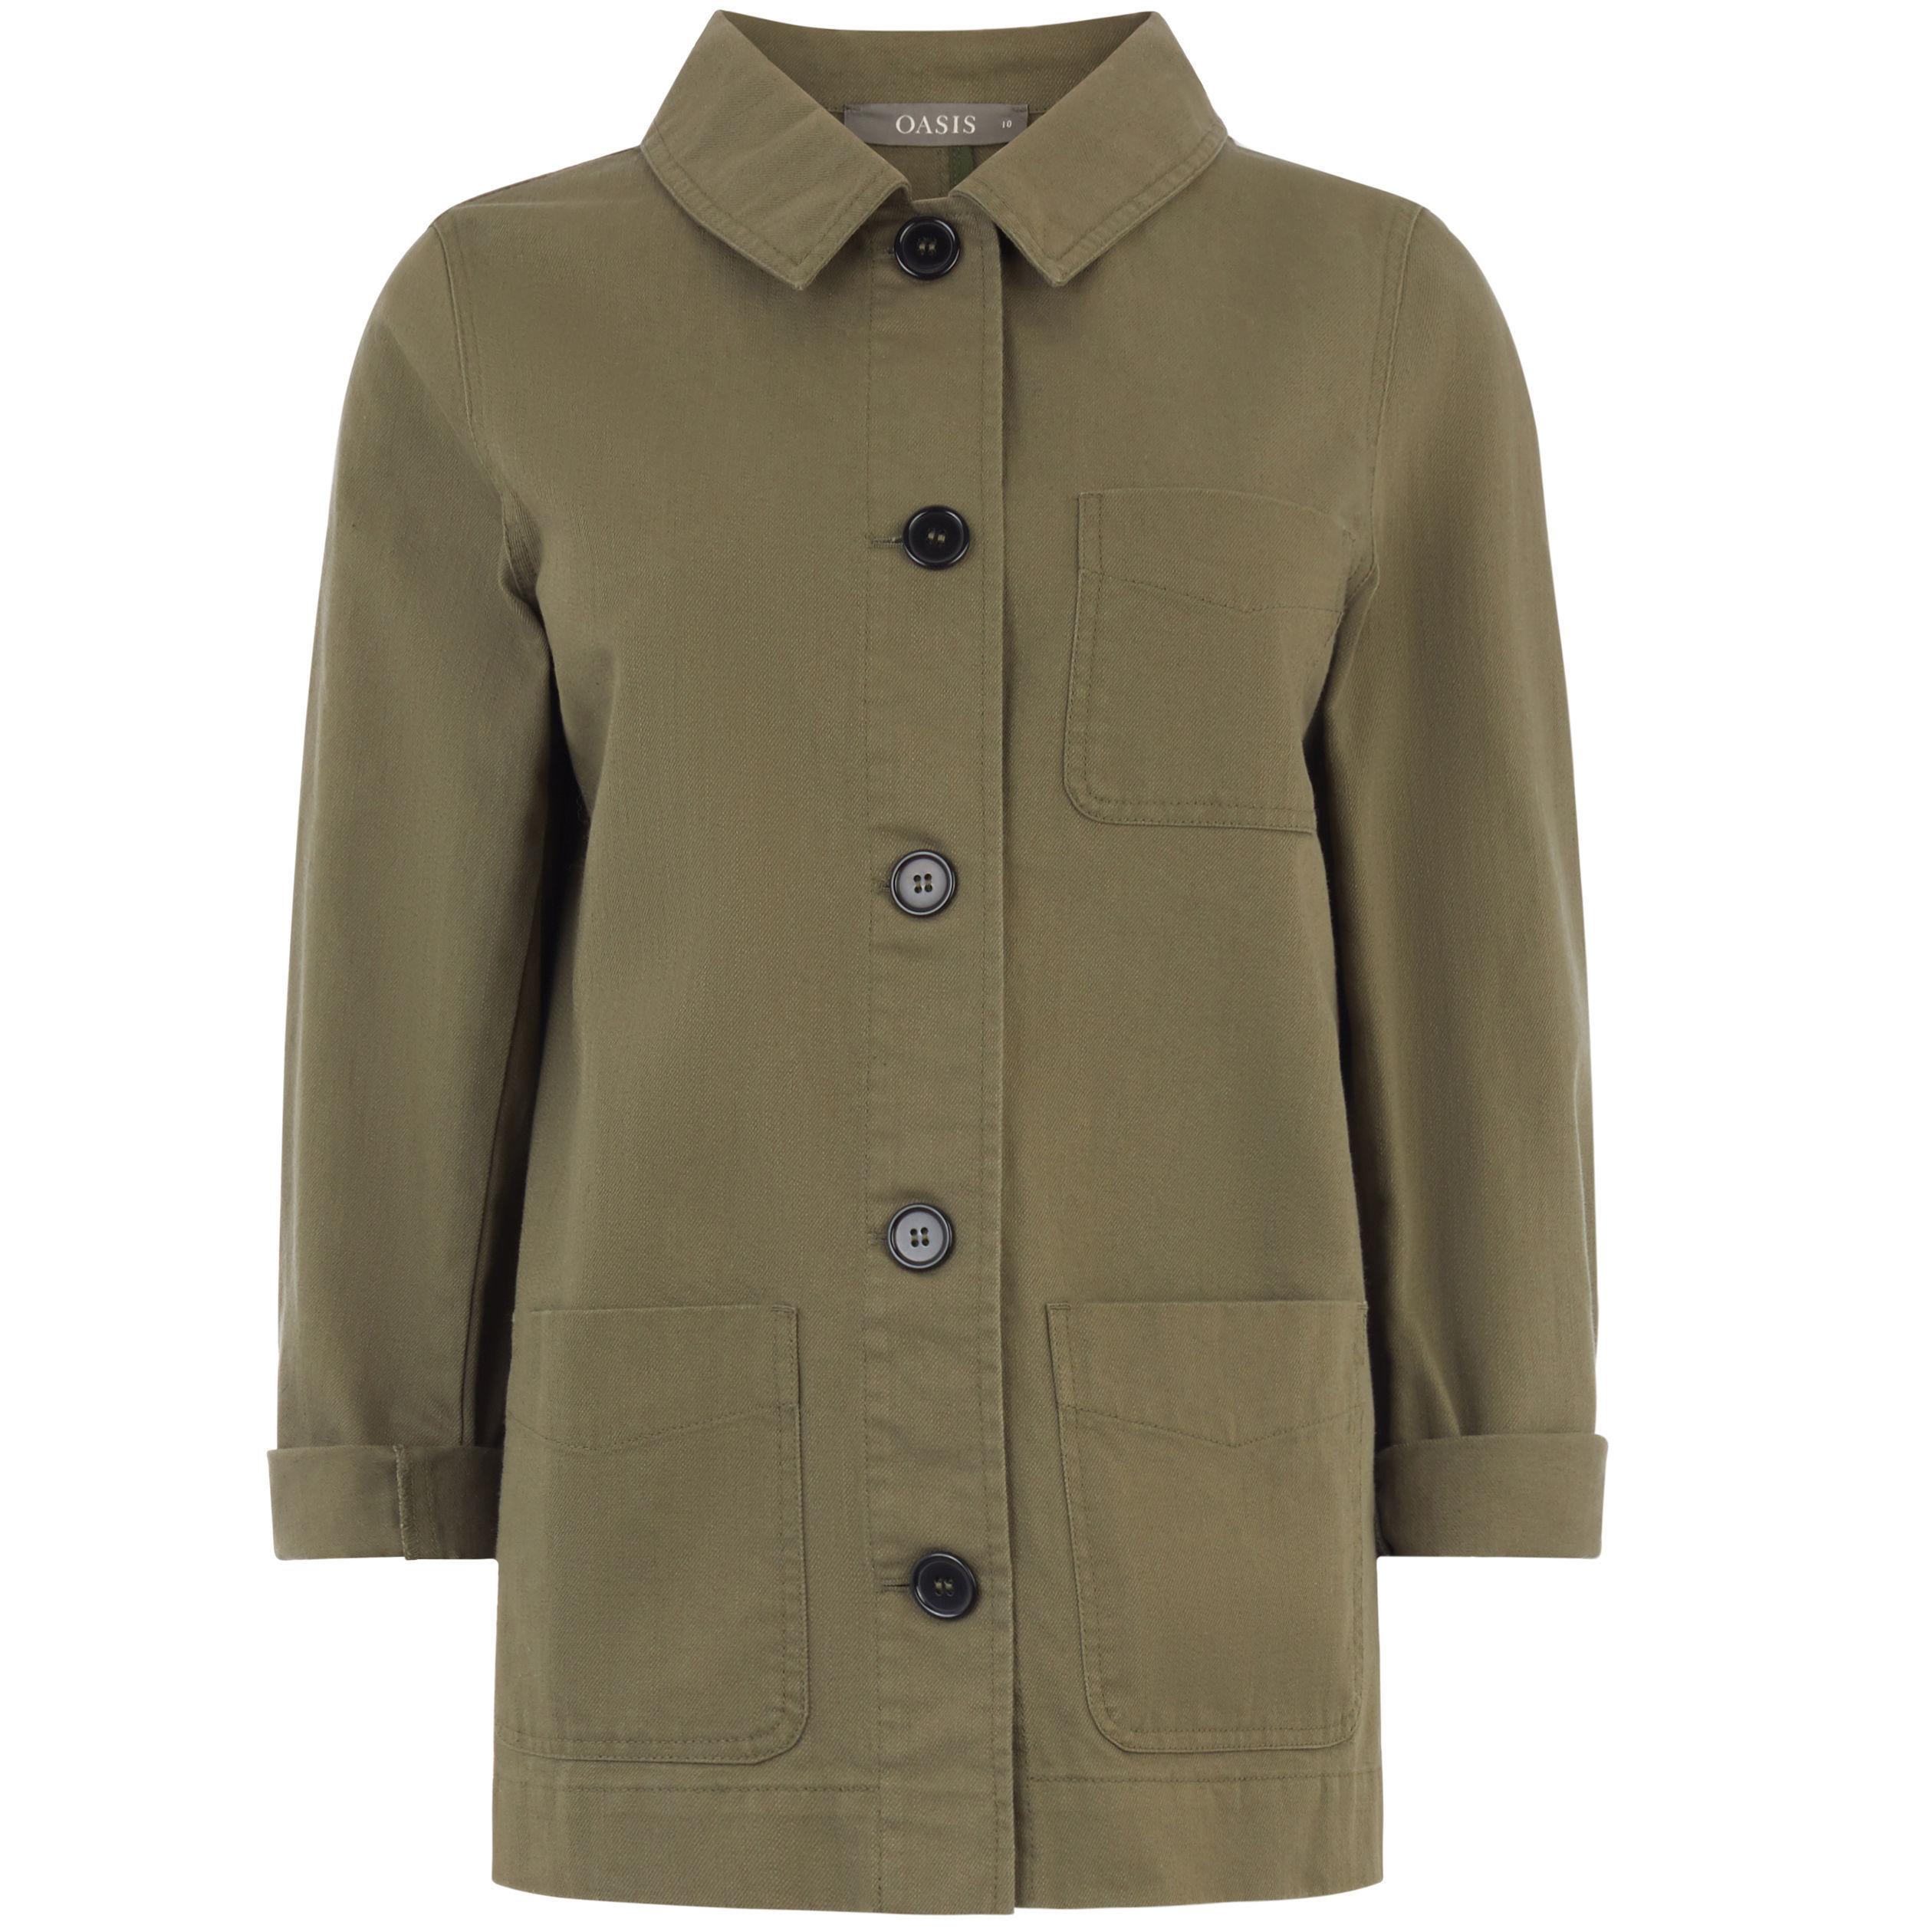 4. Oasis Utility Jacket